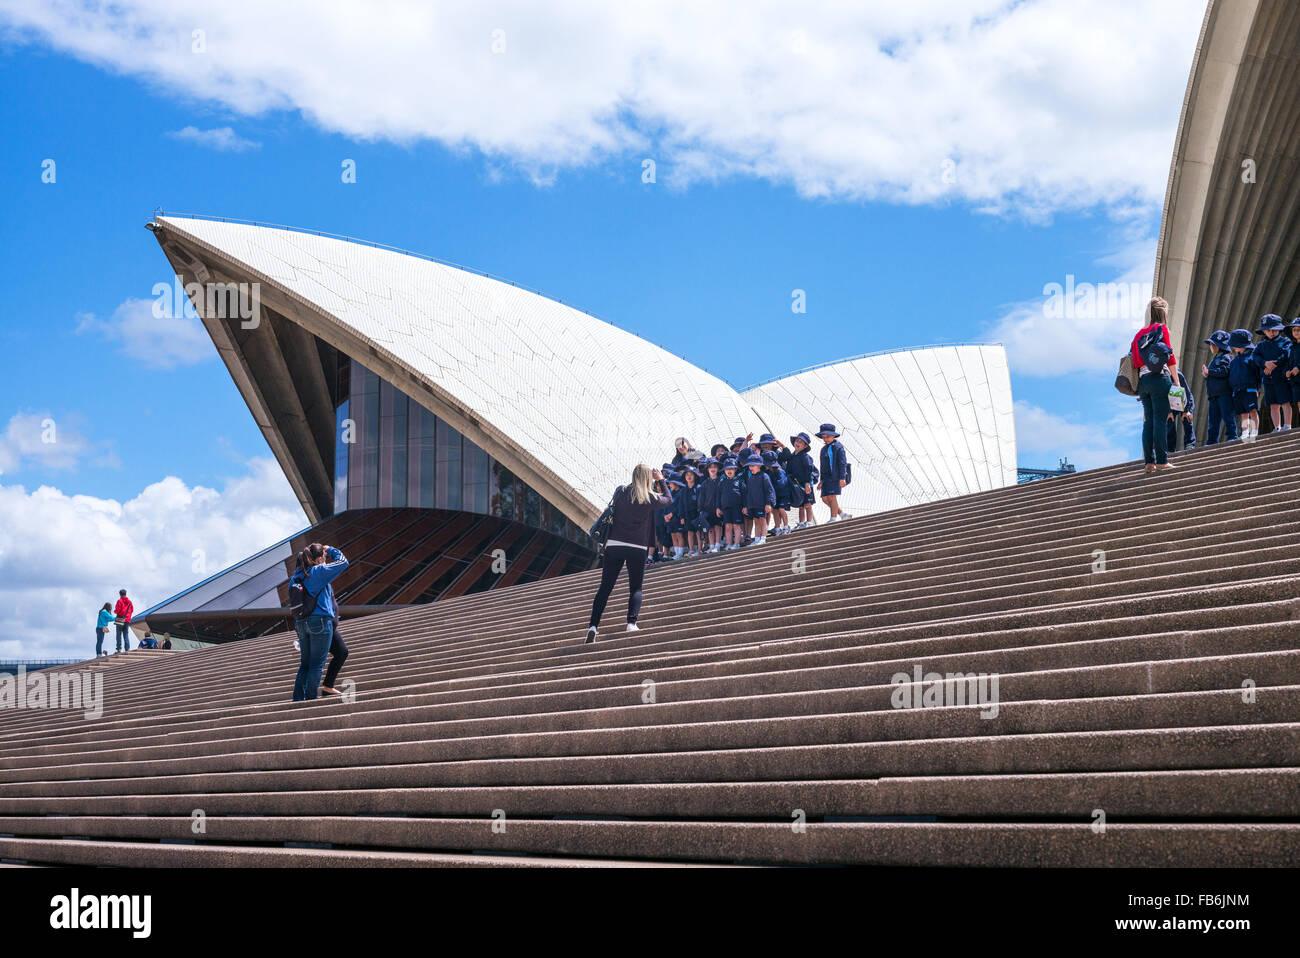 Australia, Sydney, tourists on the flight of steps of the Opera House Stock Photo